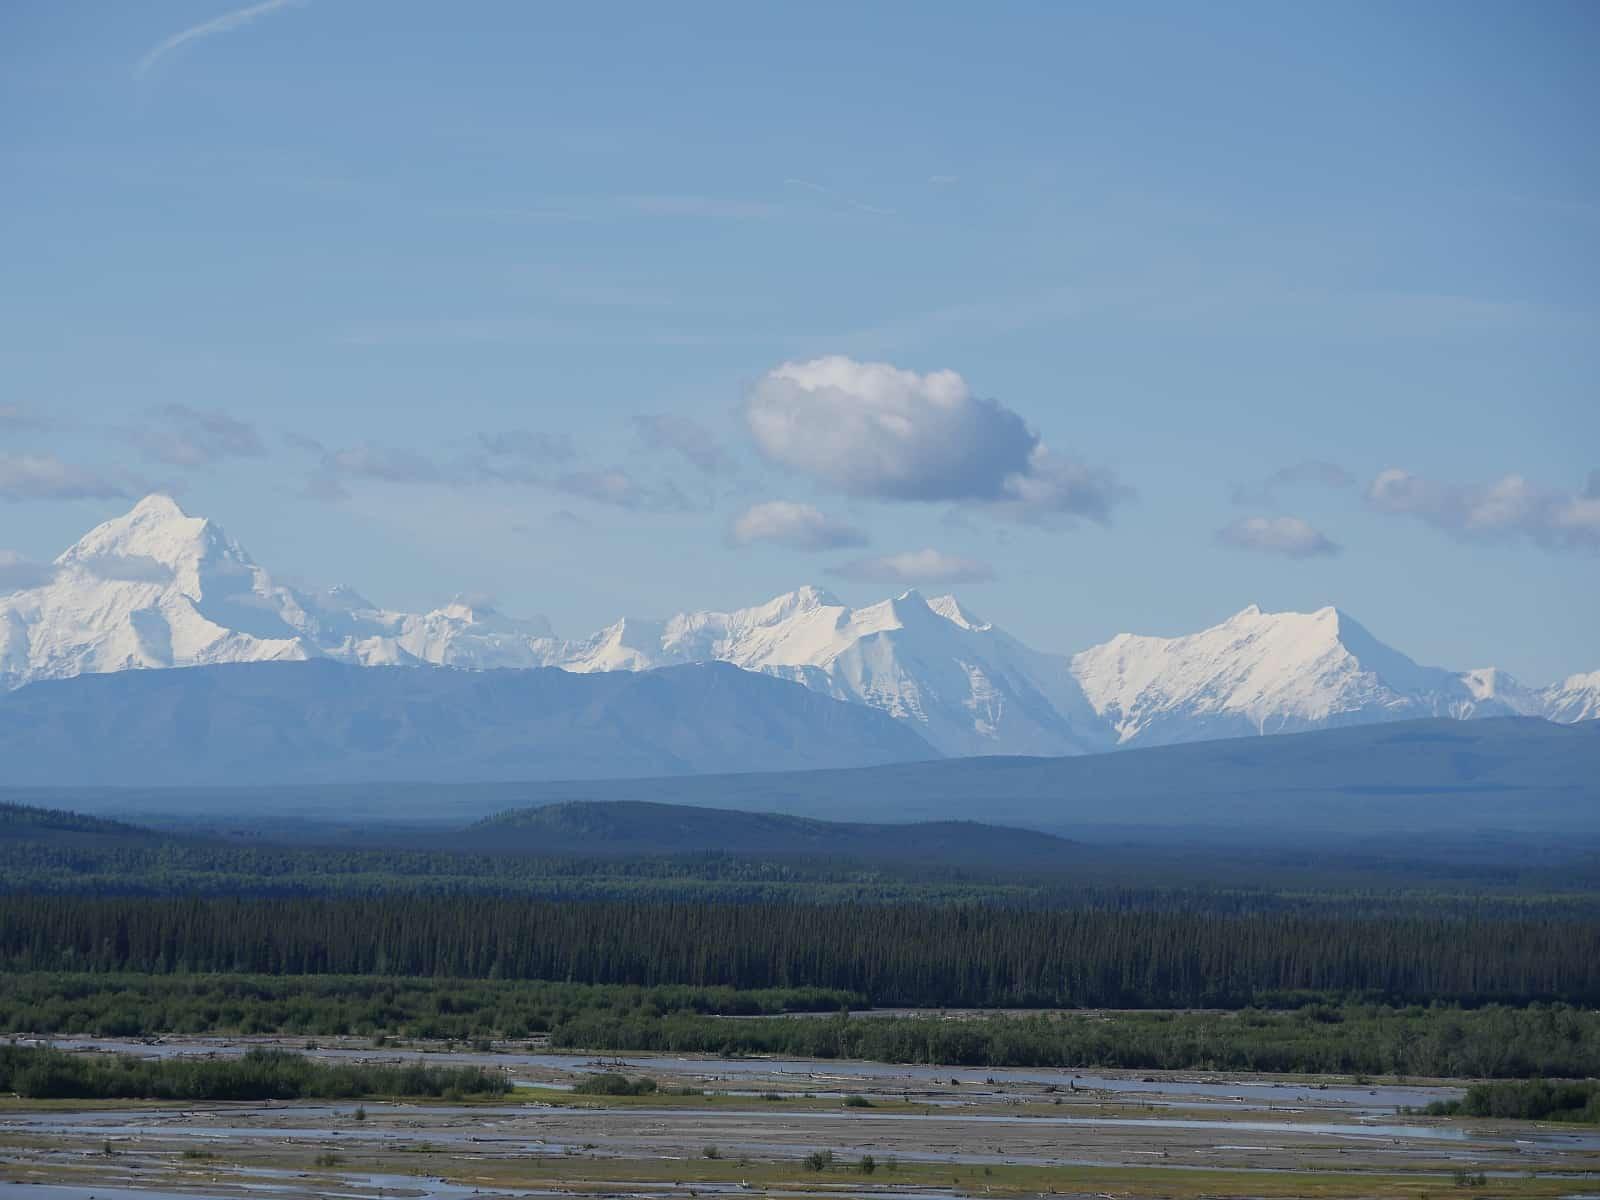 Alaska verzaubert mit traumhaften Landschaften. Foto Alfred Pradel